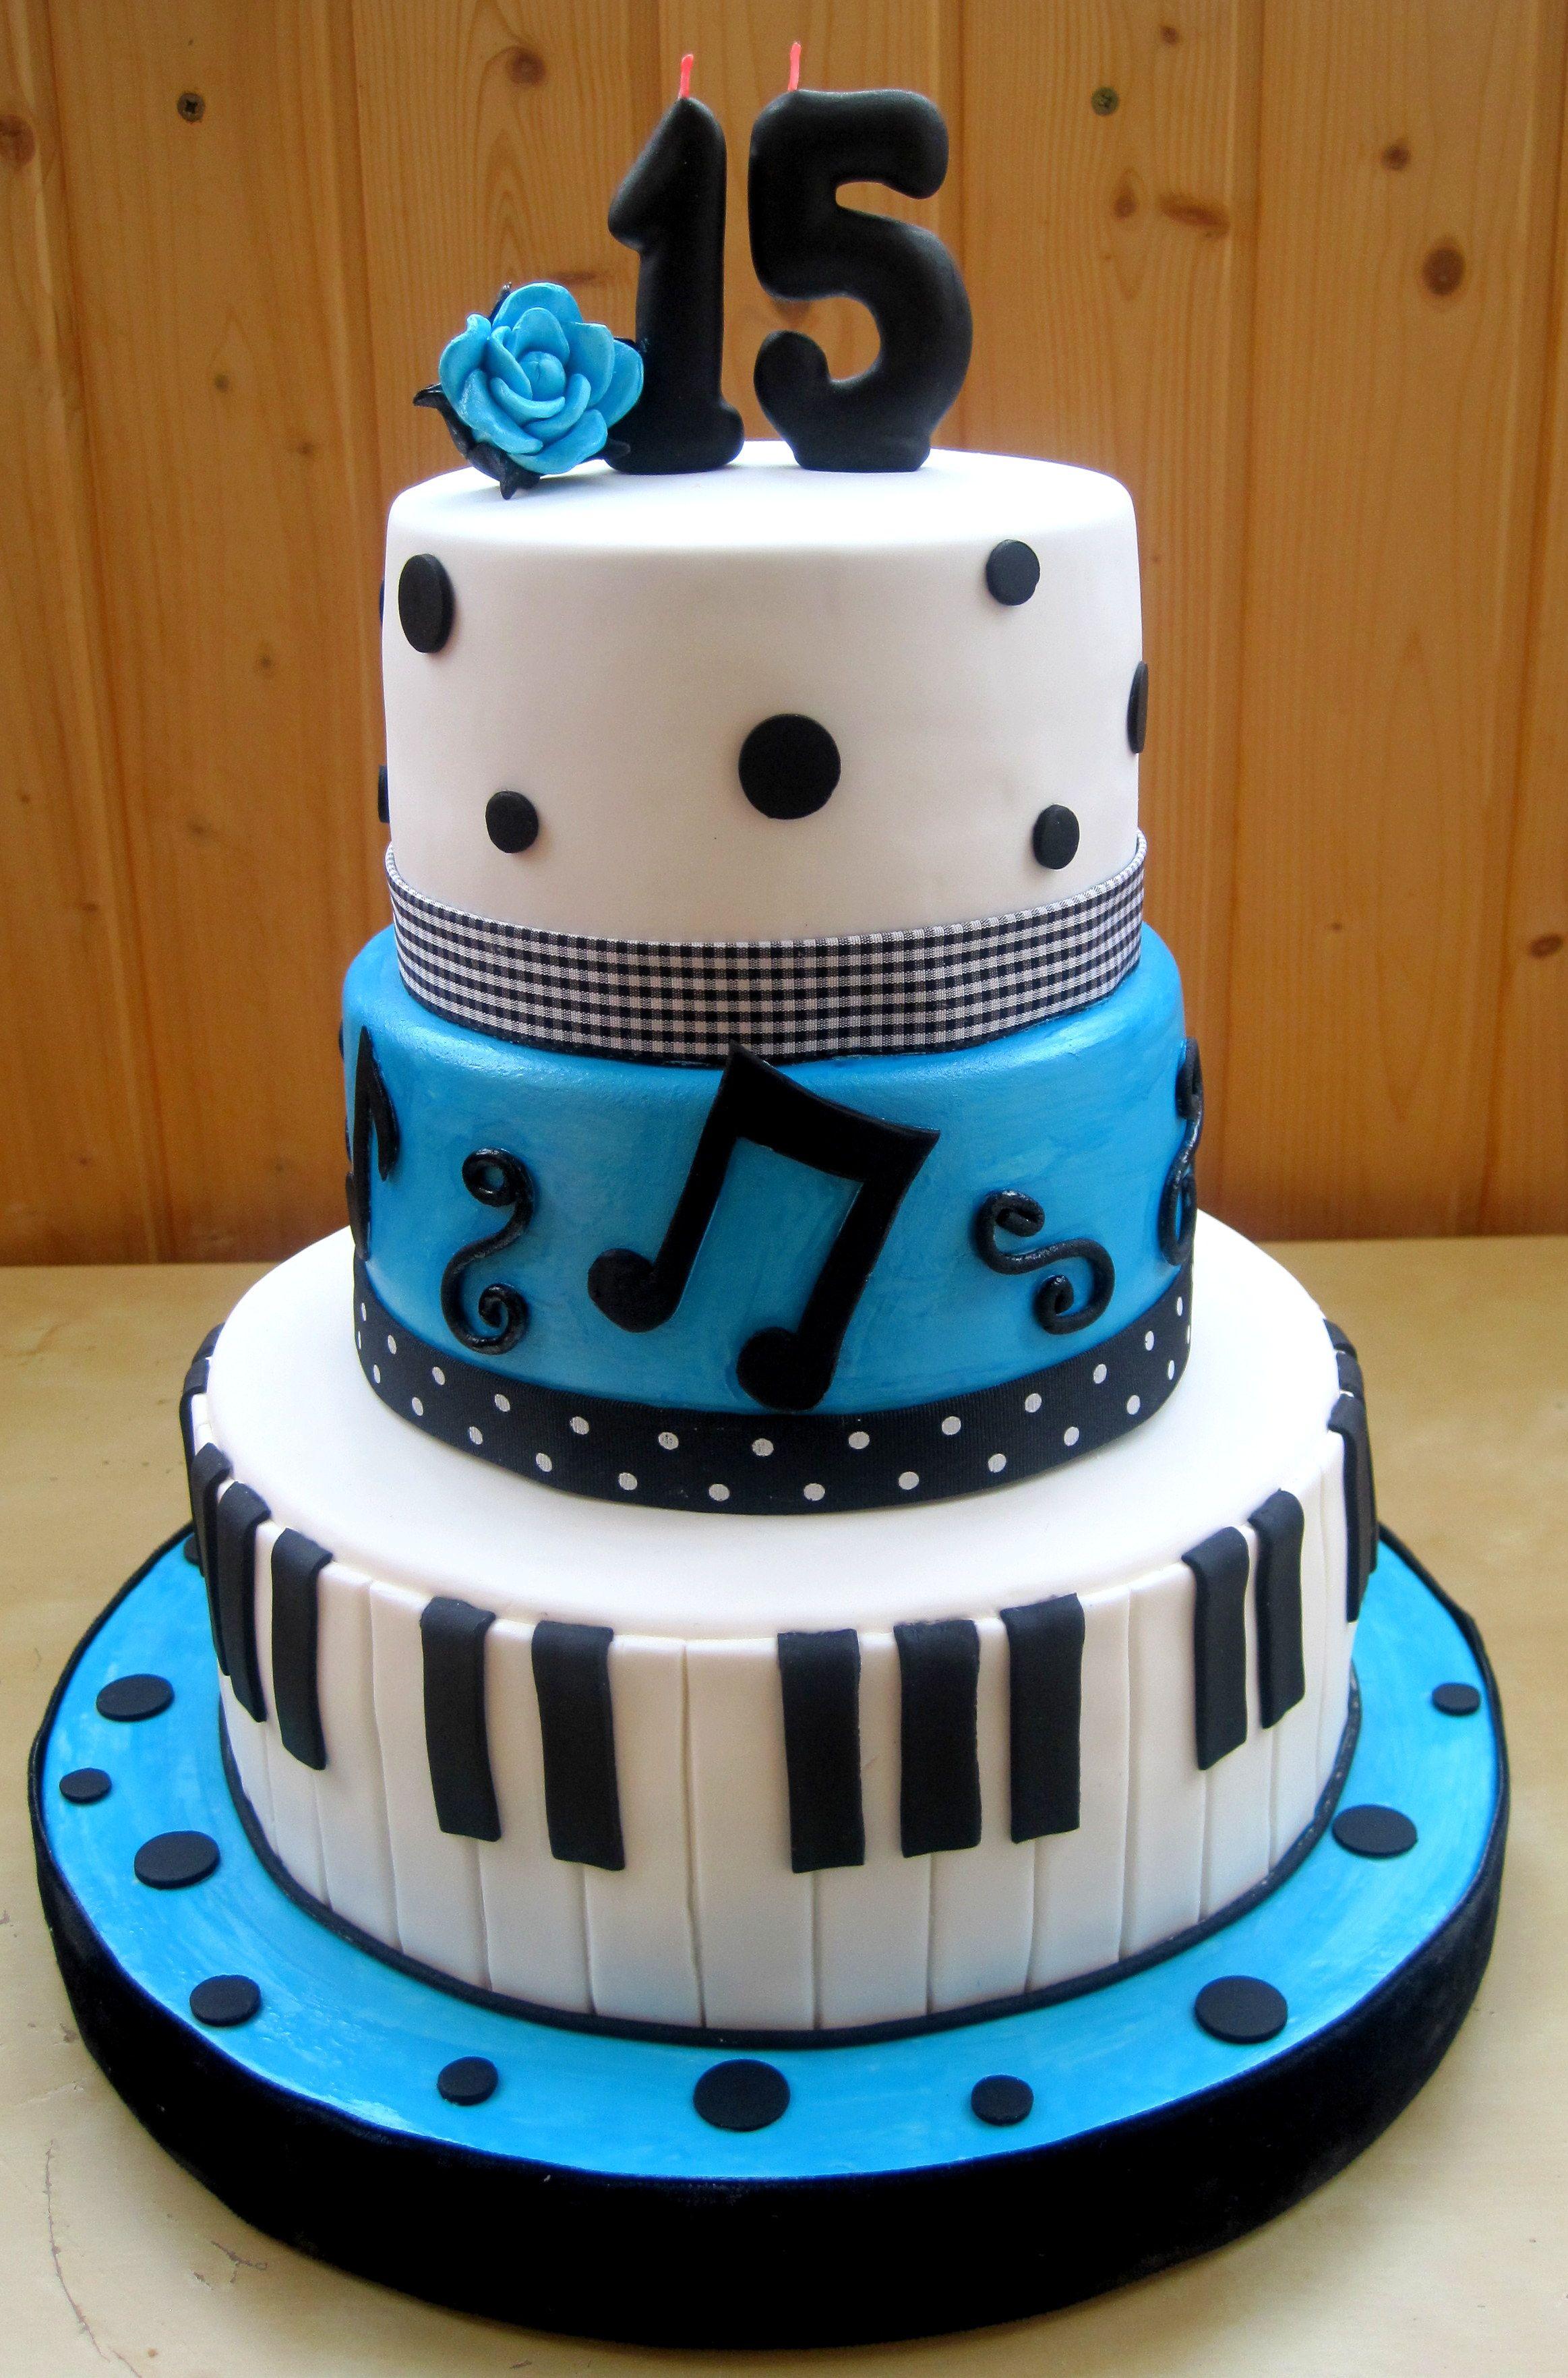 Music Cake Th Birthday Cake My Sweet Creations Wwwfacebook - 15 year birthday cake